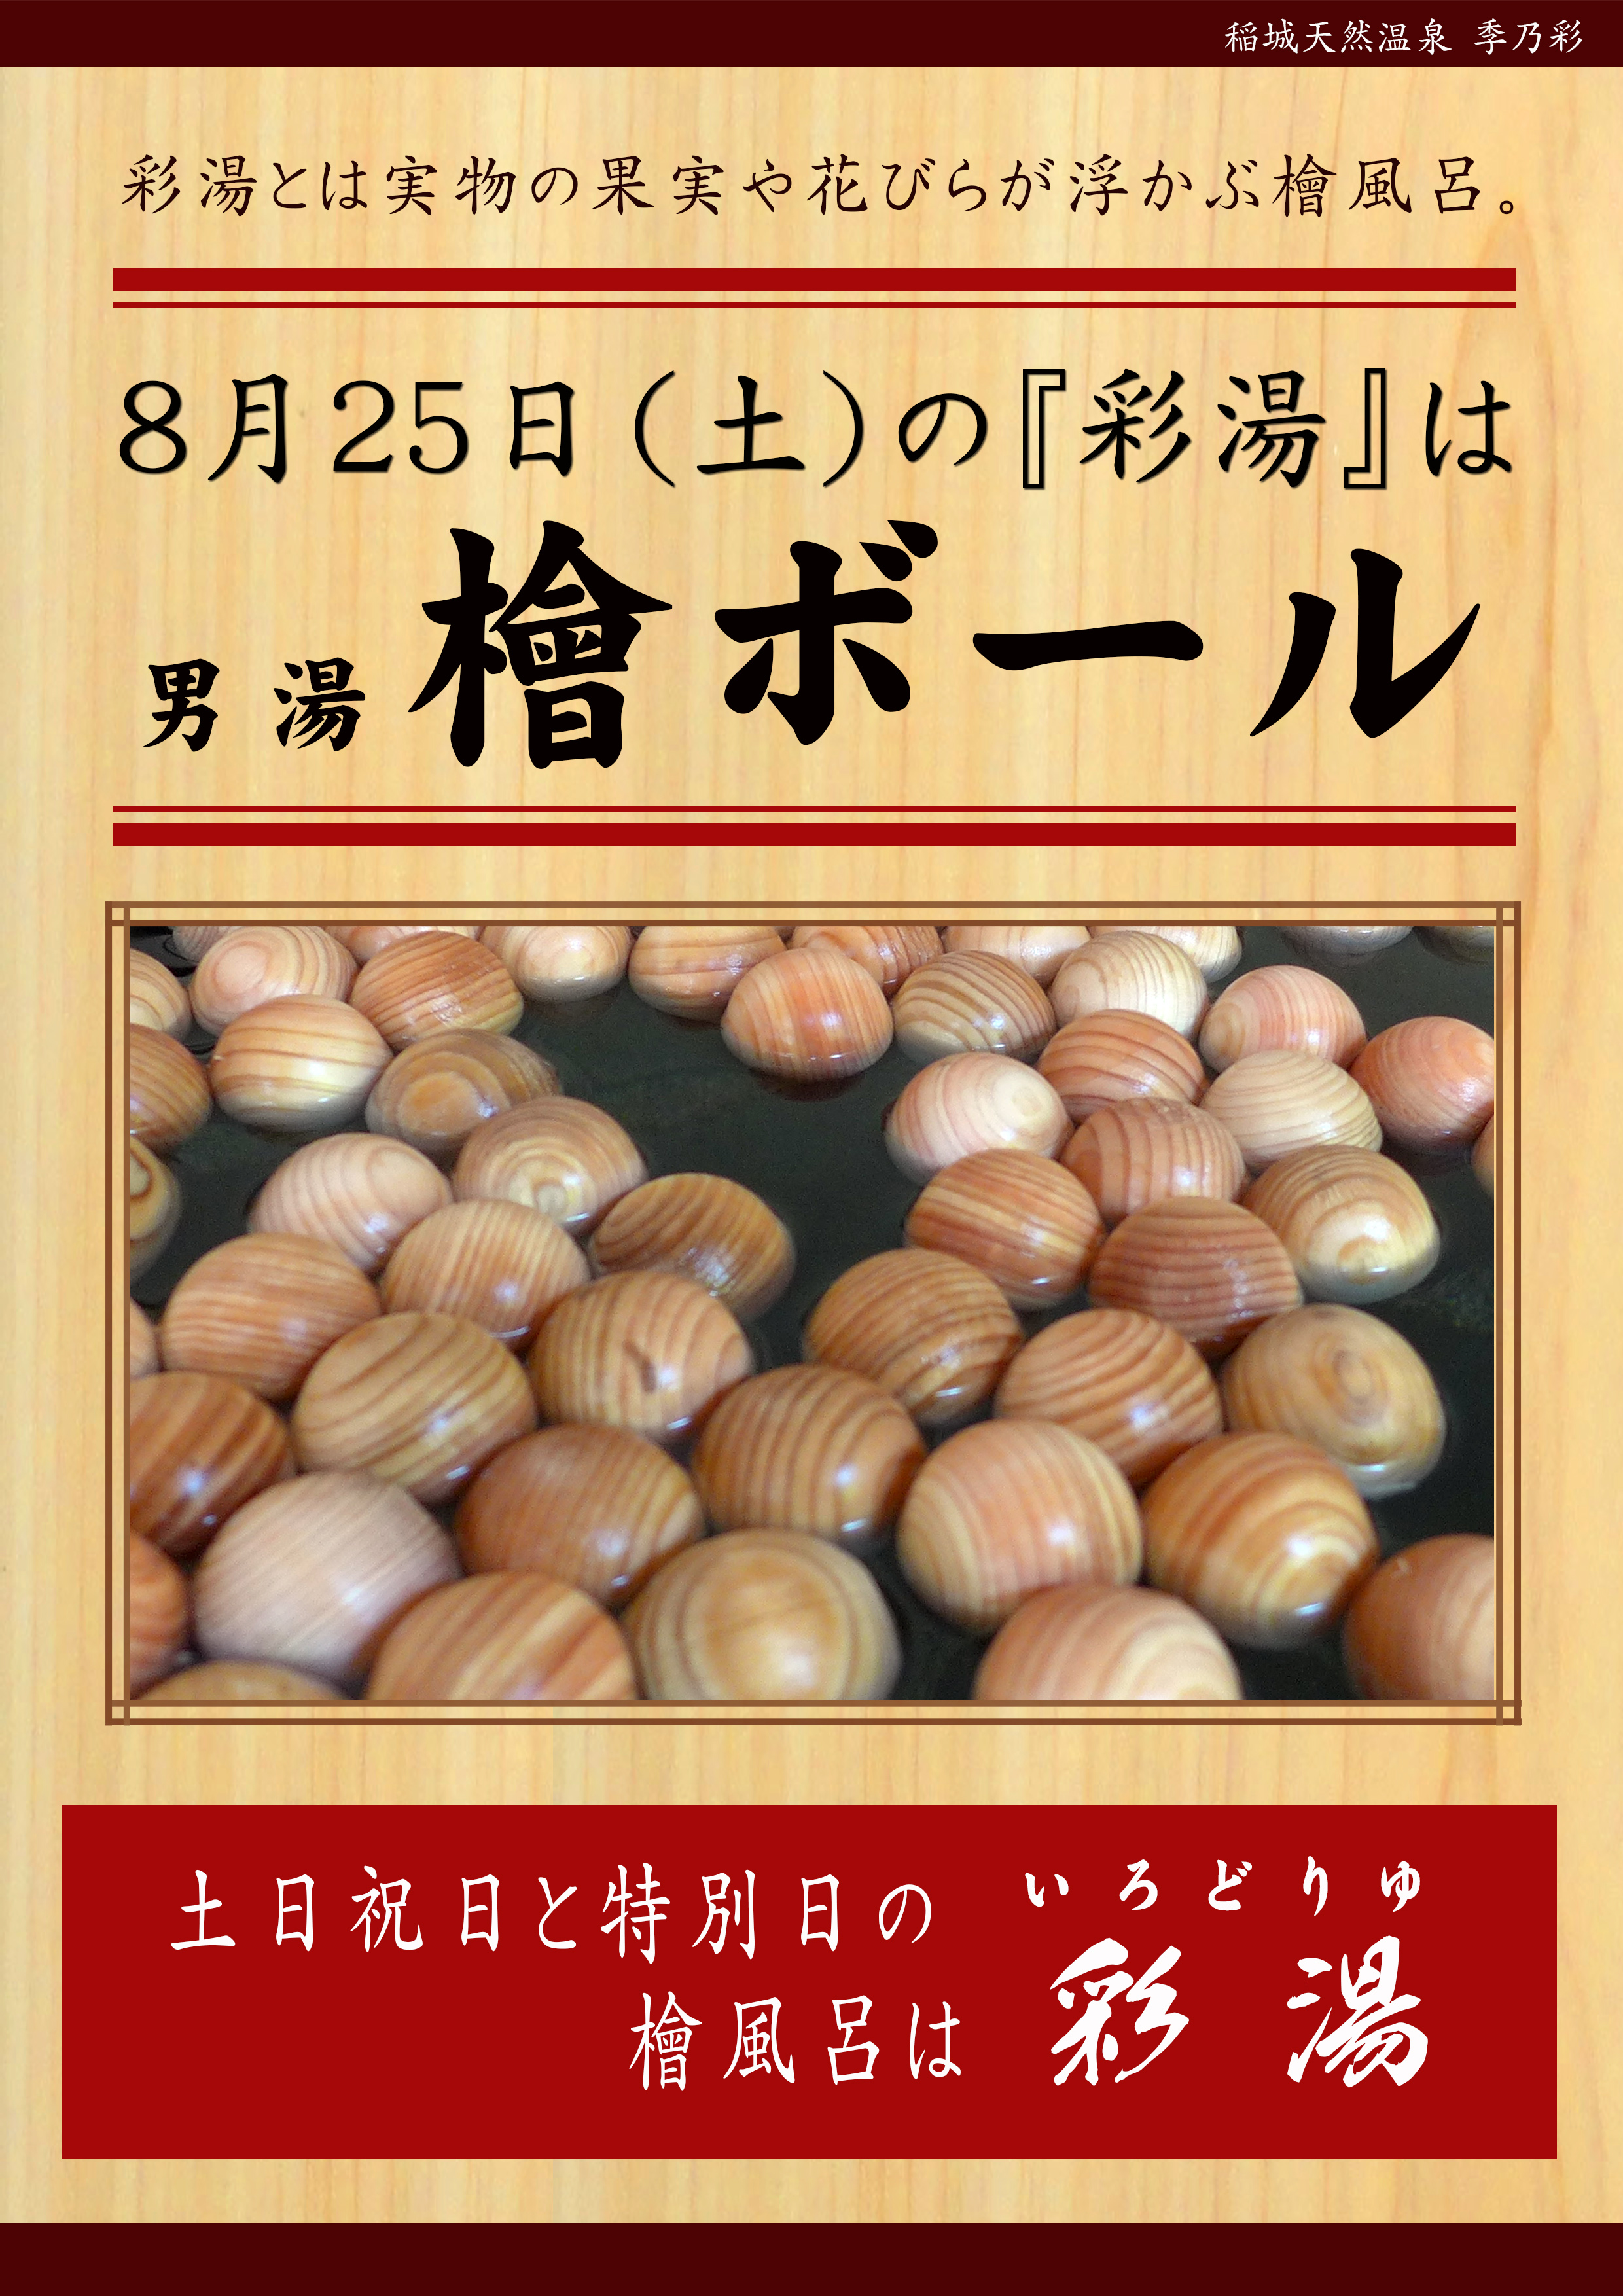 20180825POP イベント 彩湯 男湯 檜ボール